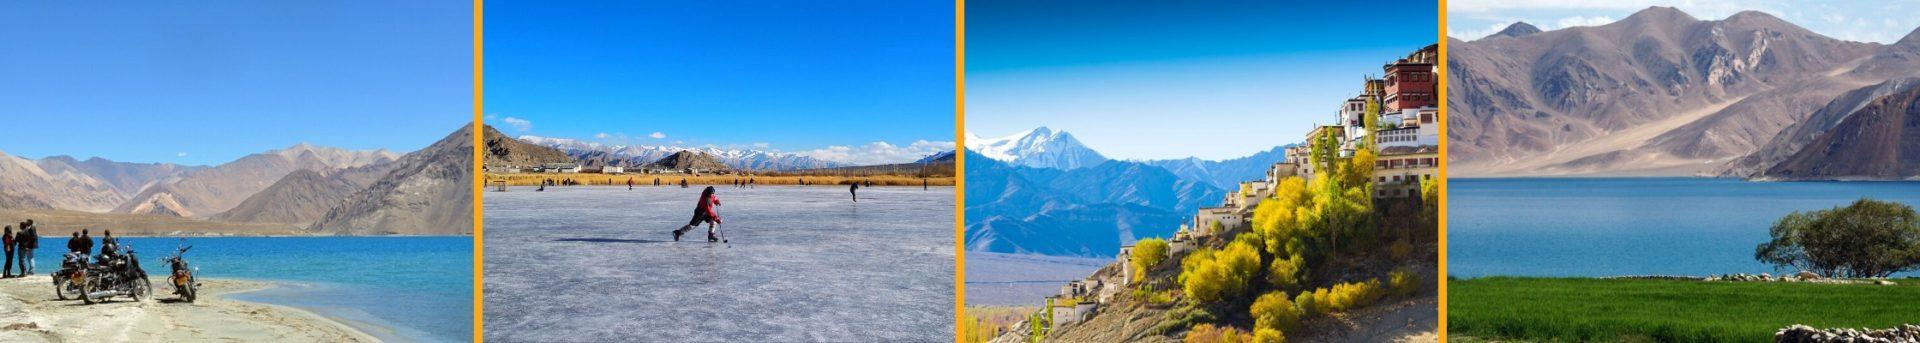 Covid travel updates for Ladakh